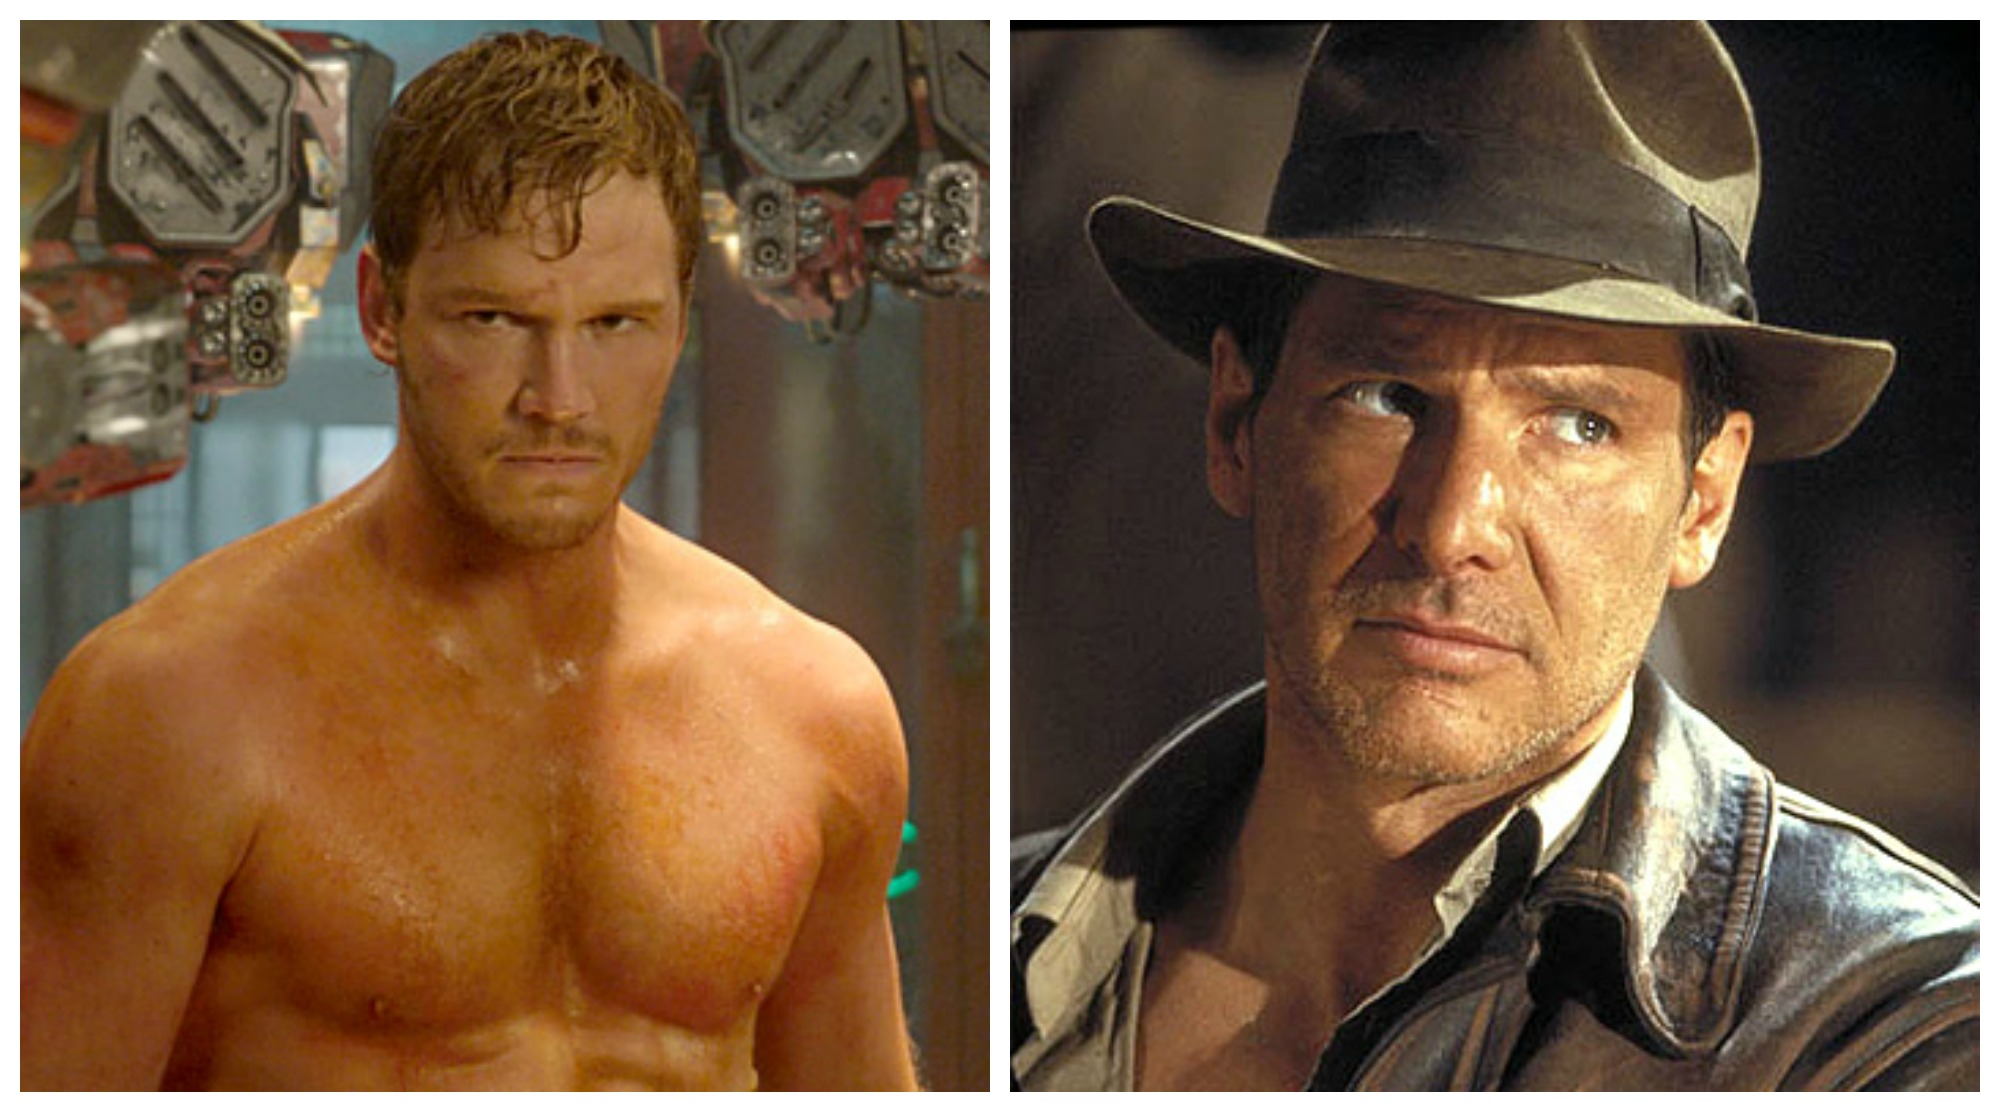 Disney Reportedly Eyeing Chris Pratt for Indiana Jones Relaunch